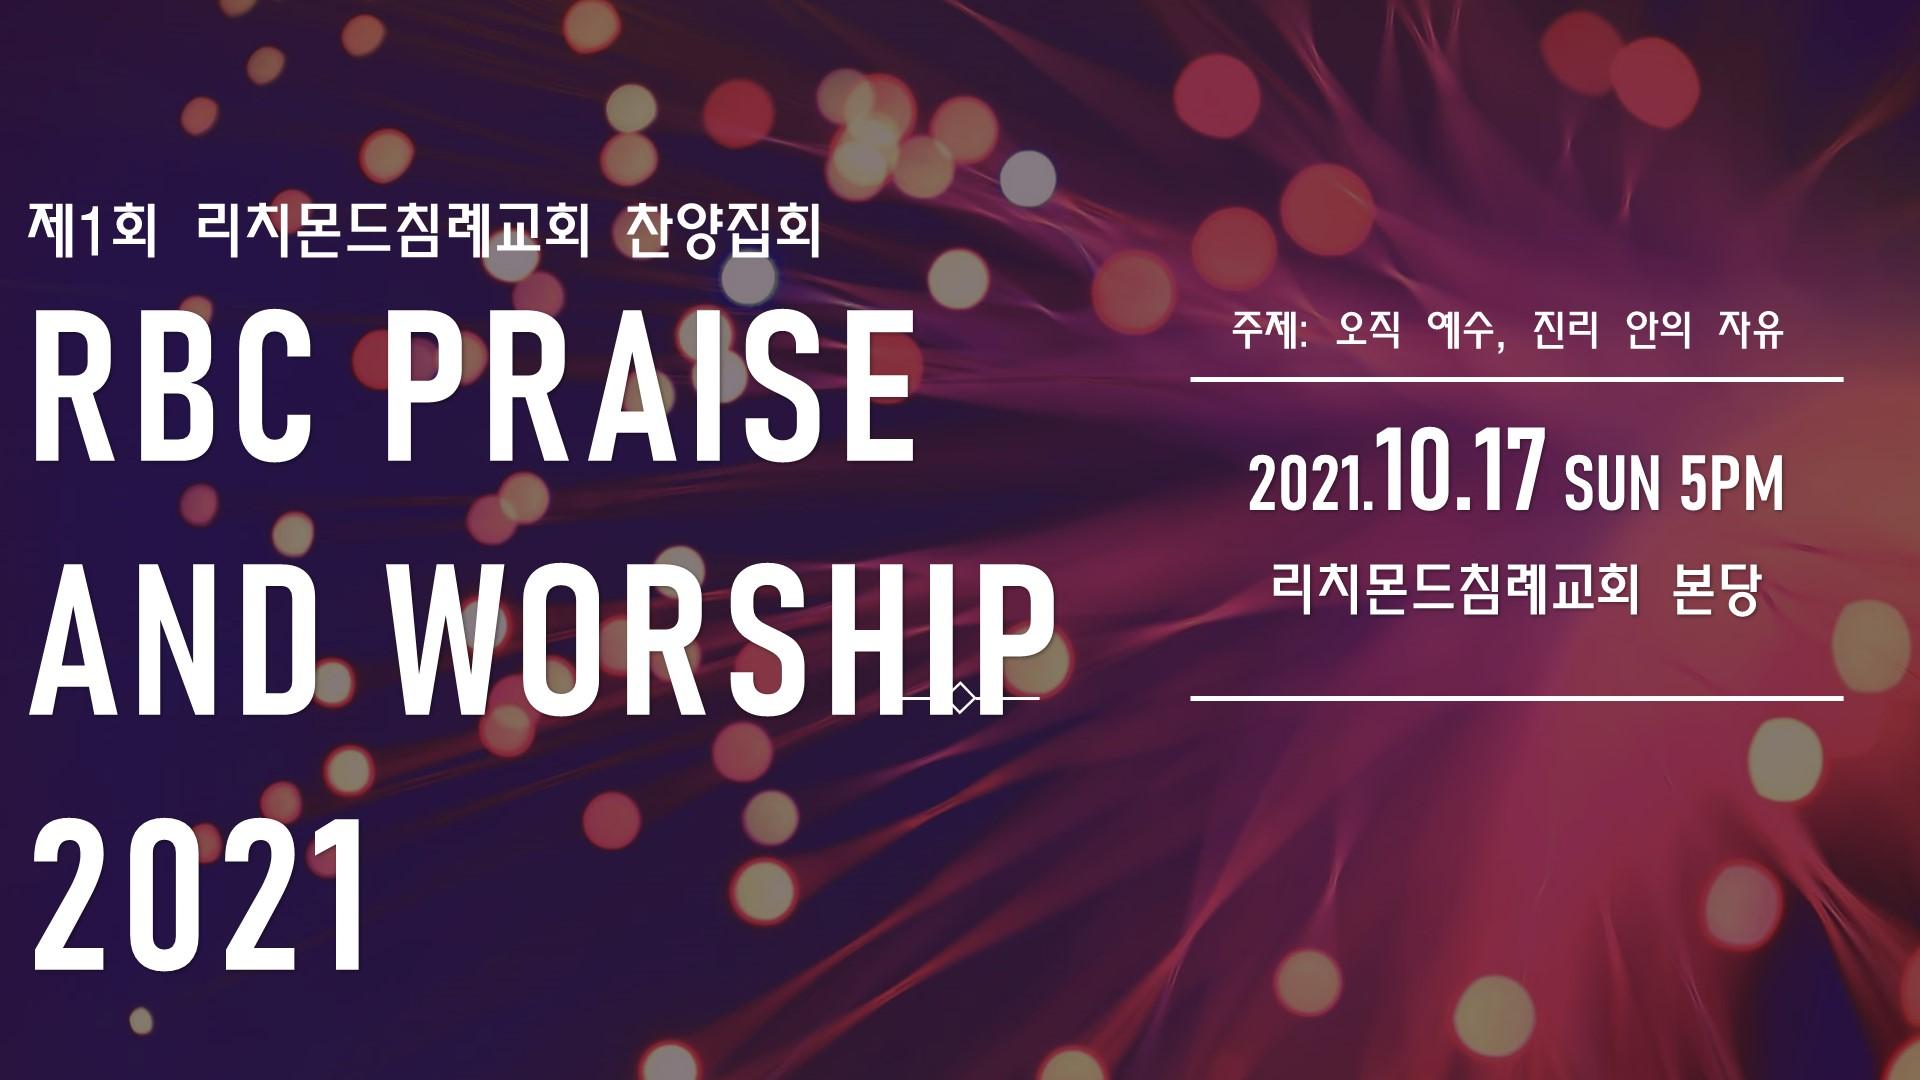 RBC PRAISE AND WORSHIP 배너.jpg